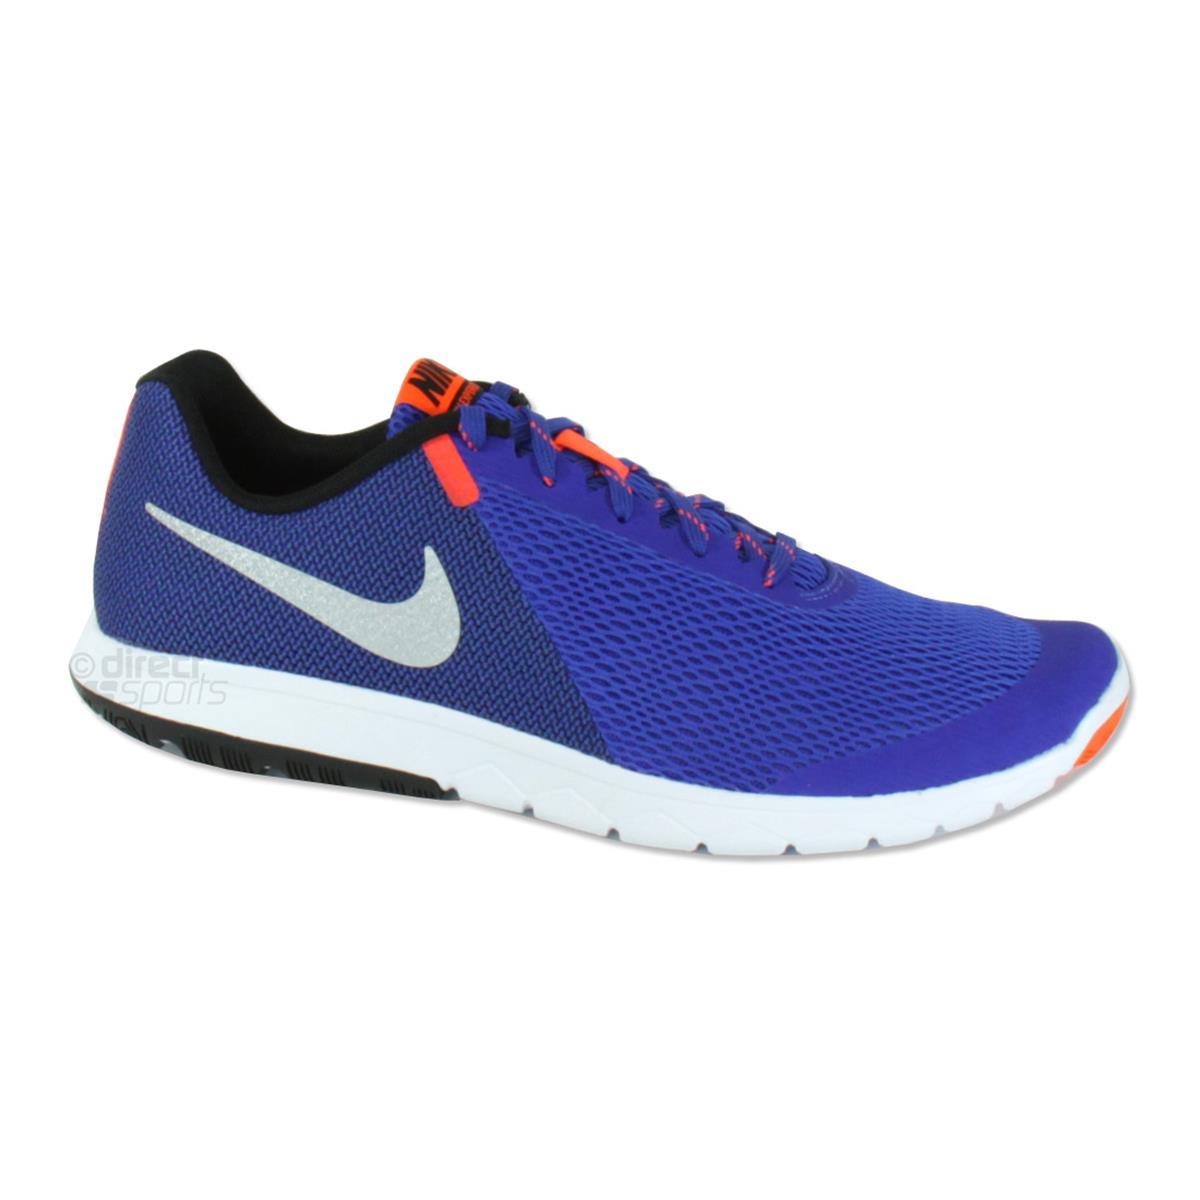 ac73b20fd1f6a ... Nike Flex Experience RN 5 Mens Running Shoes (Racer Blue) ...